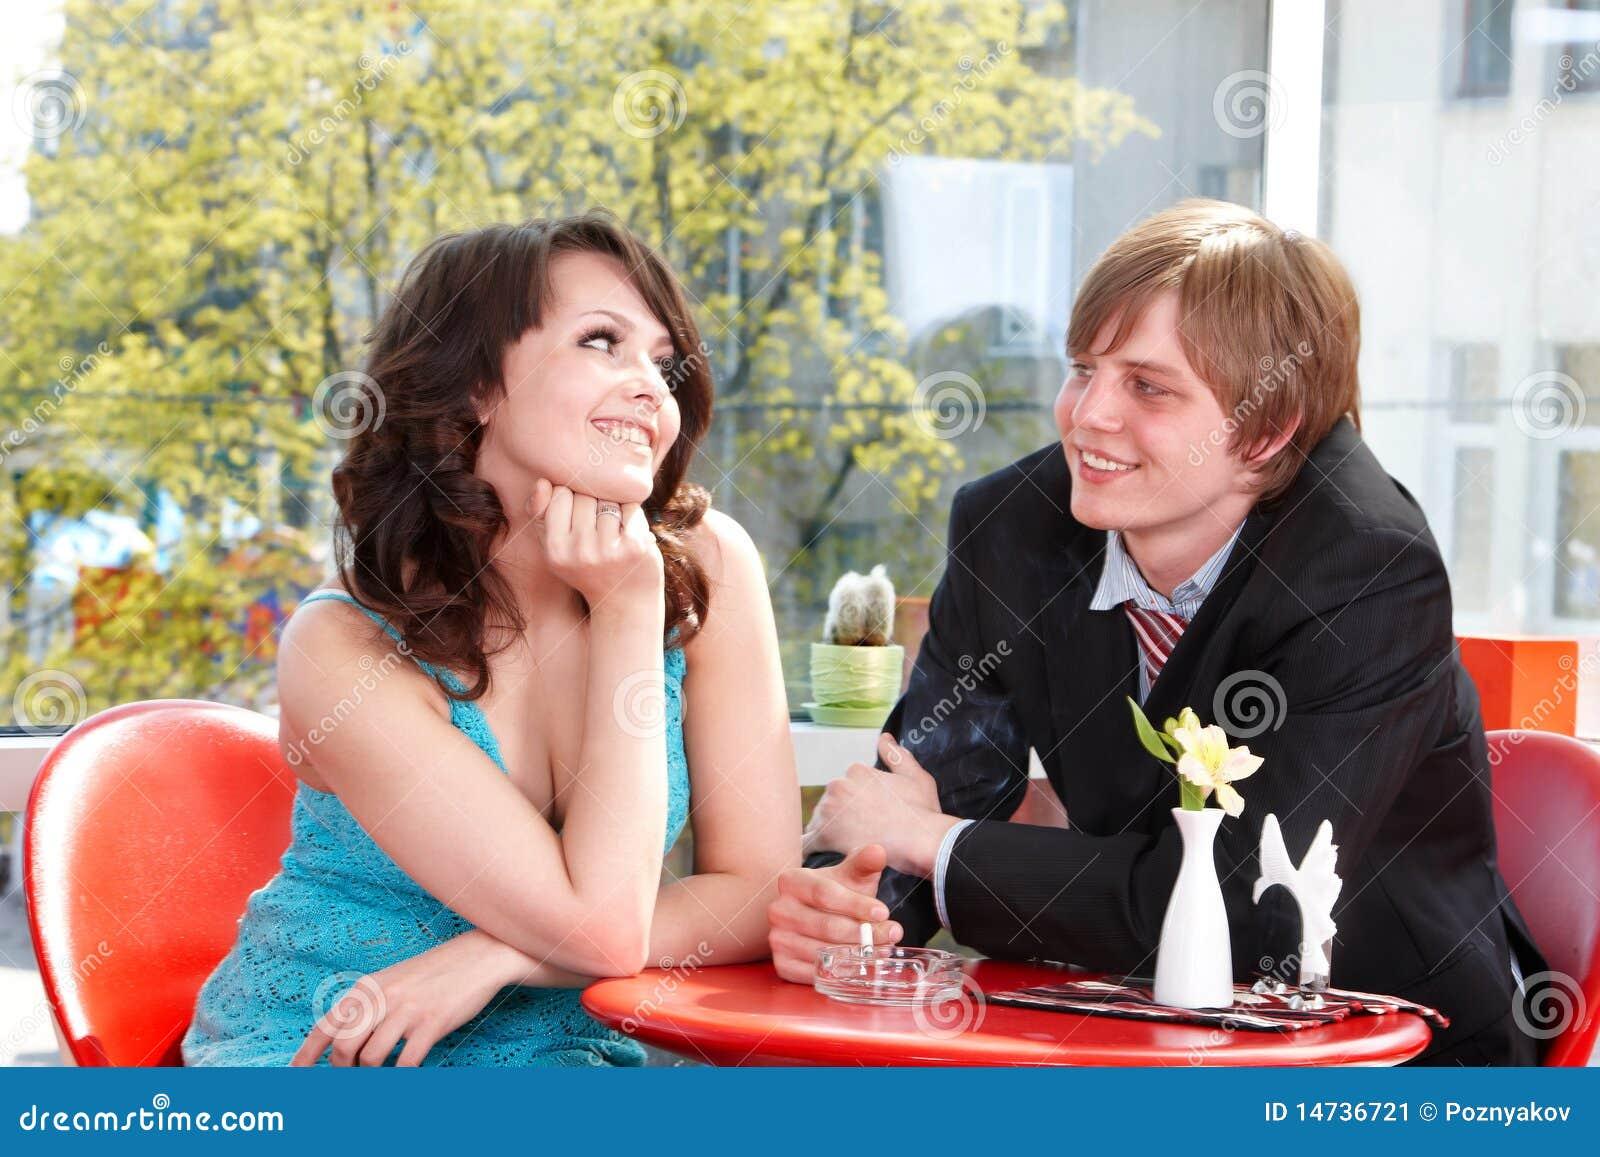 Restaurant manager dating